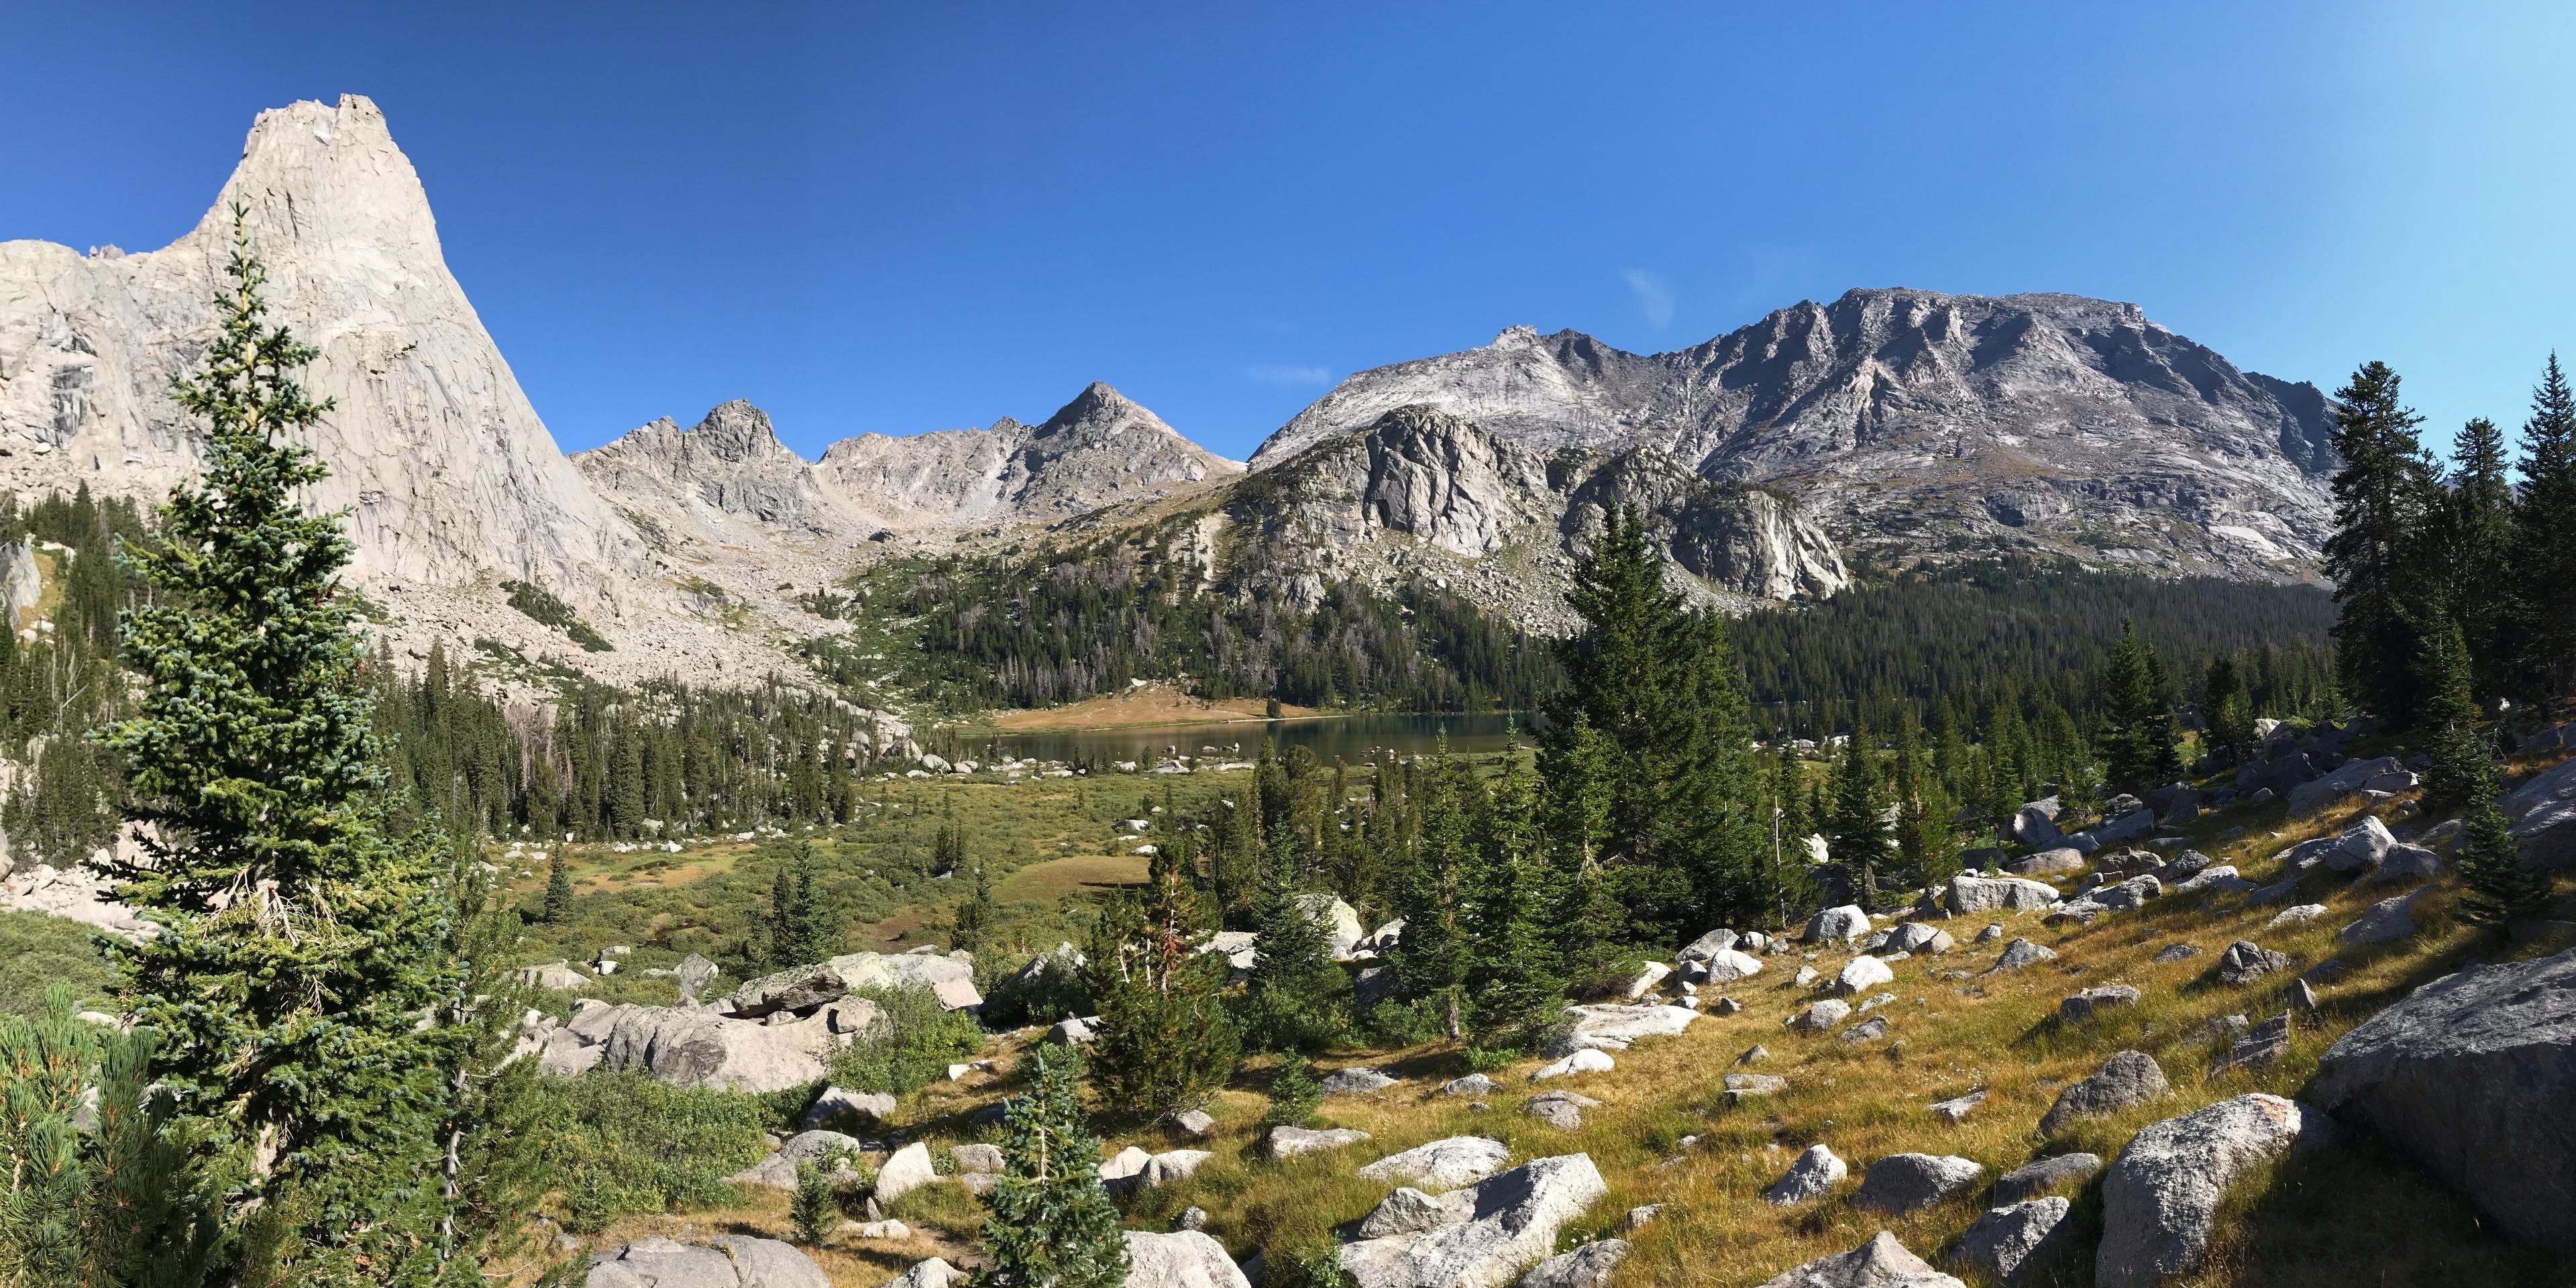 Lander, Wyoming, United States of America